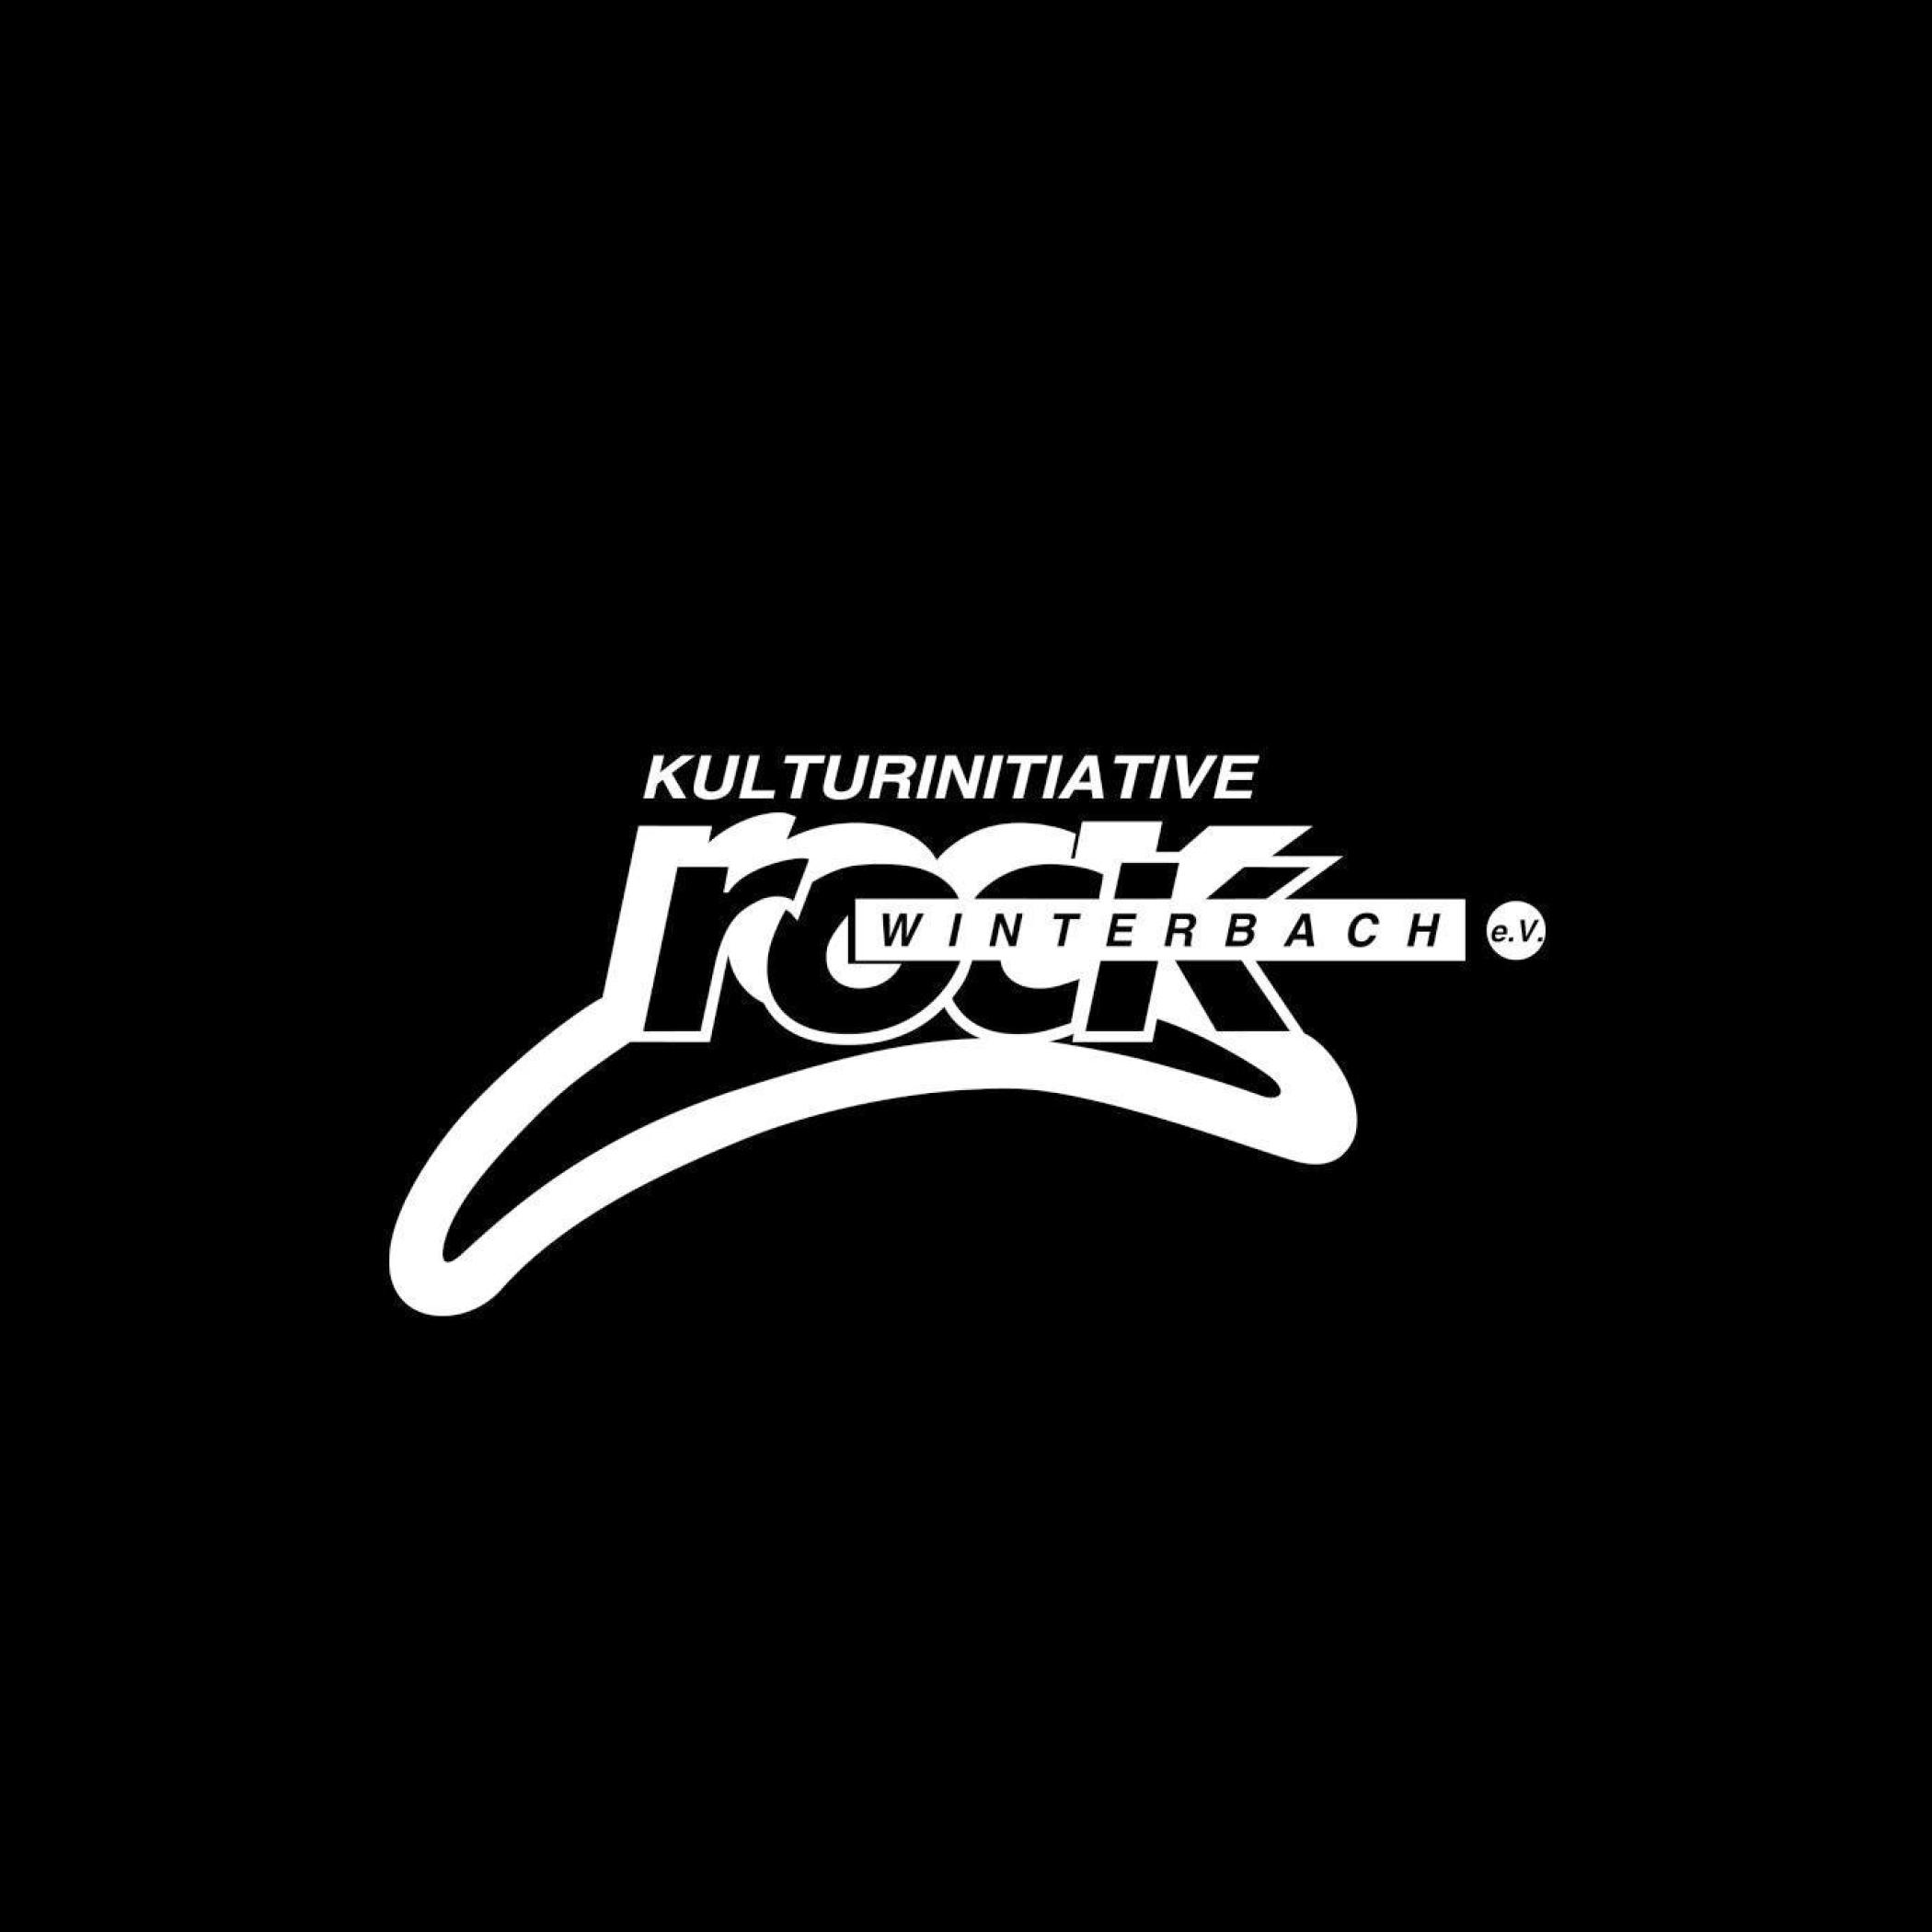 Logo Kulturinitiative Rock - Winterbach e.V.